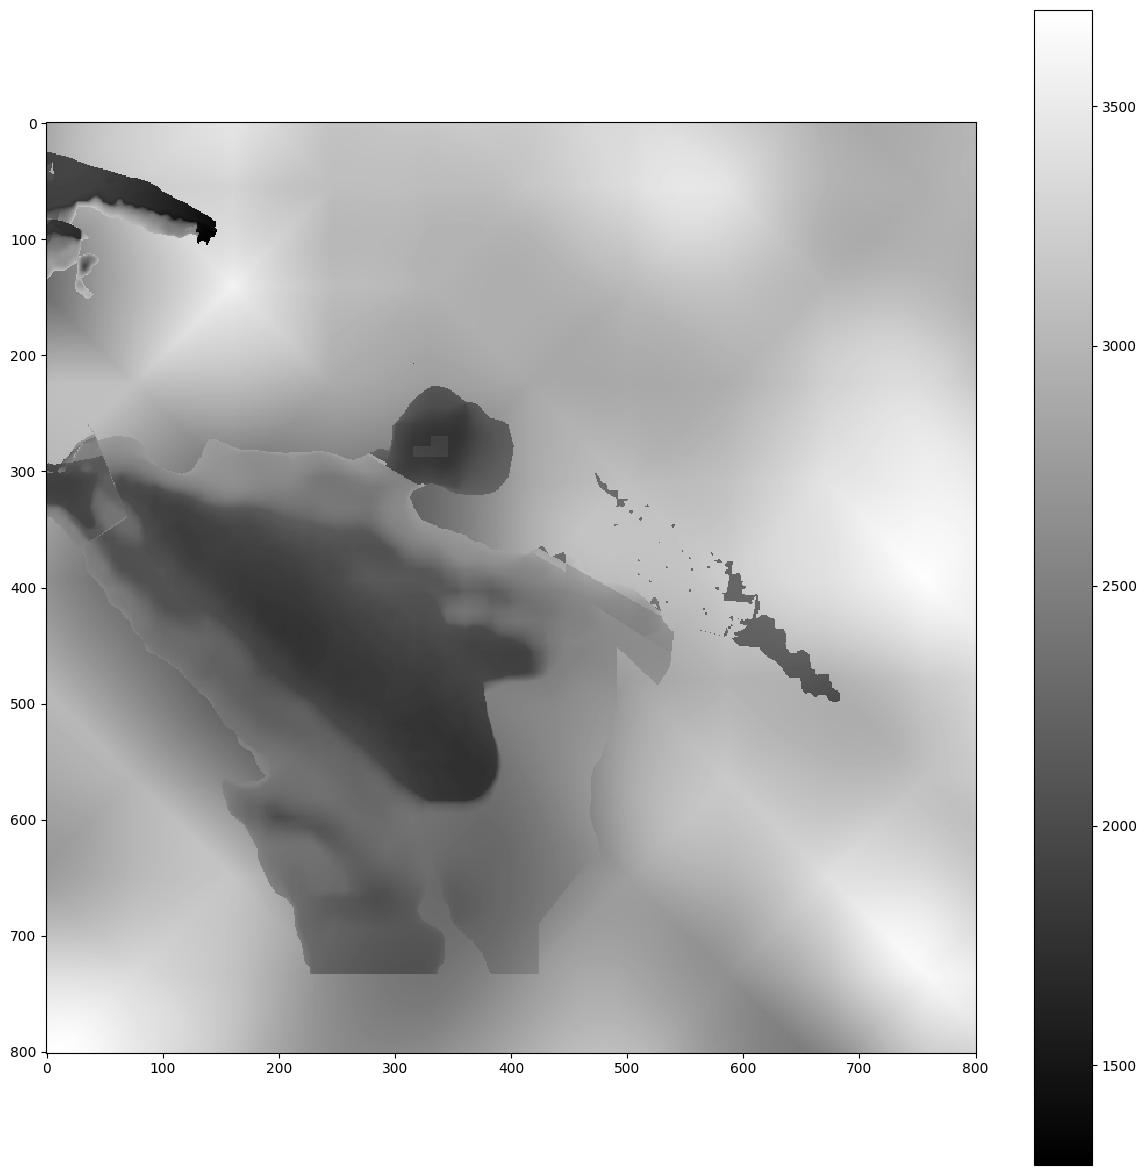 bench/seismic/wp/la_habra/meshes/velocity_model/plots/vs_2500.png